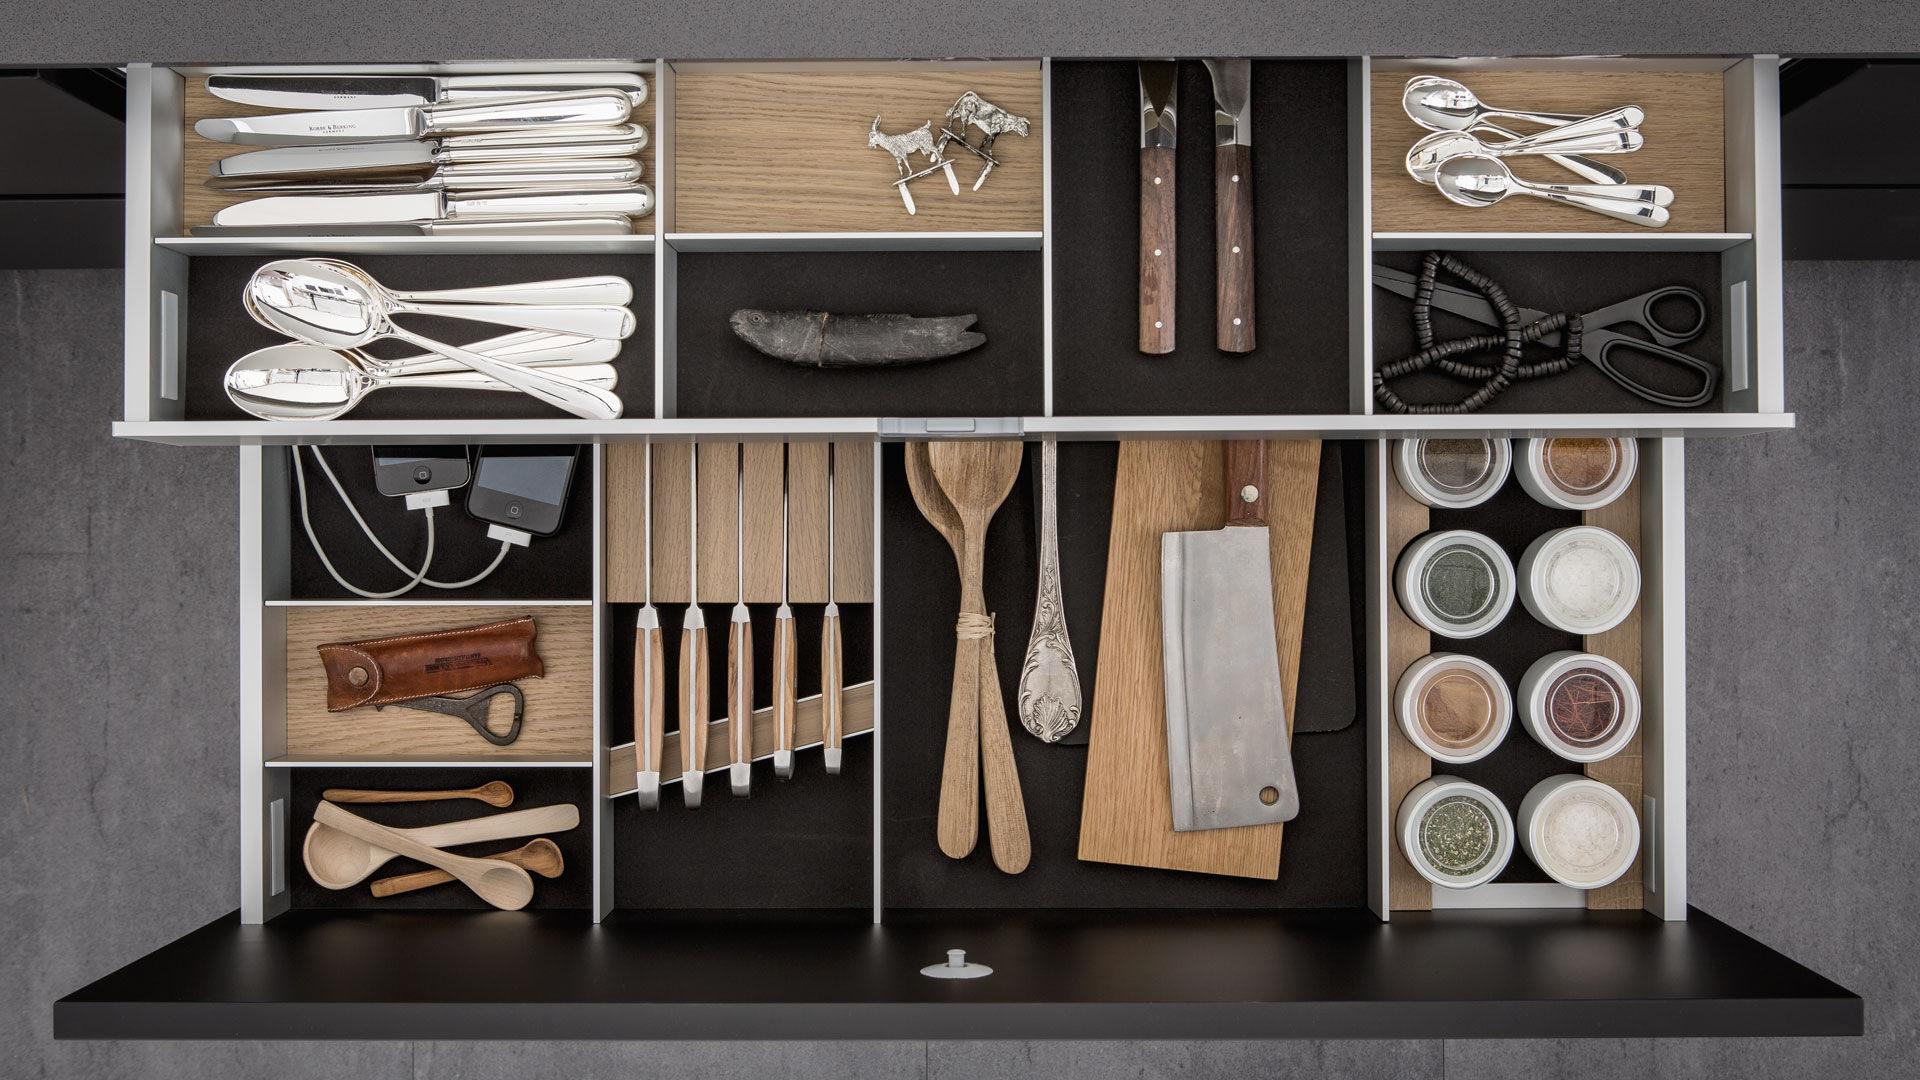 Contemporary kitchen island URBAN SE 8008 LM SIEMATIC